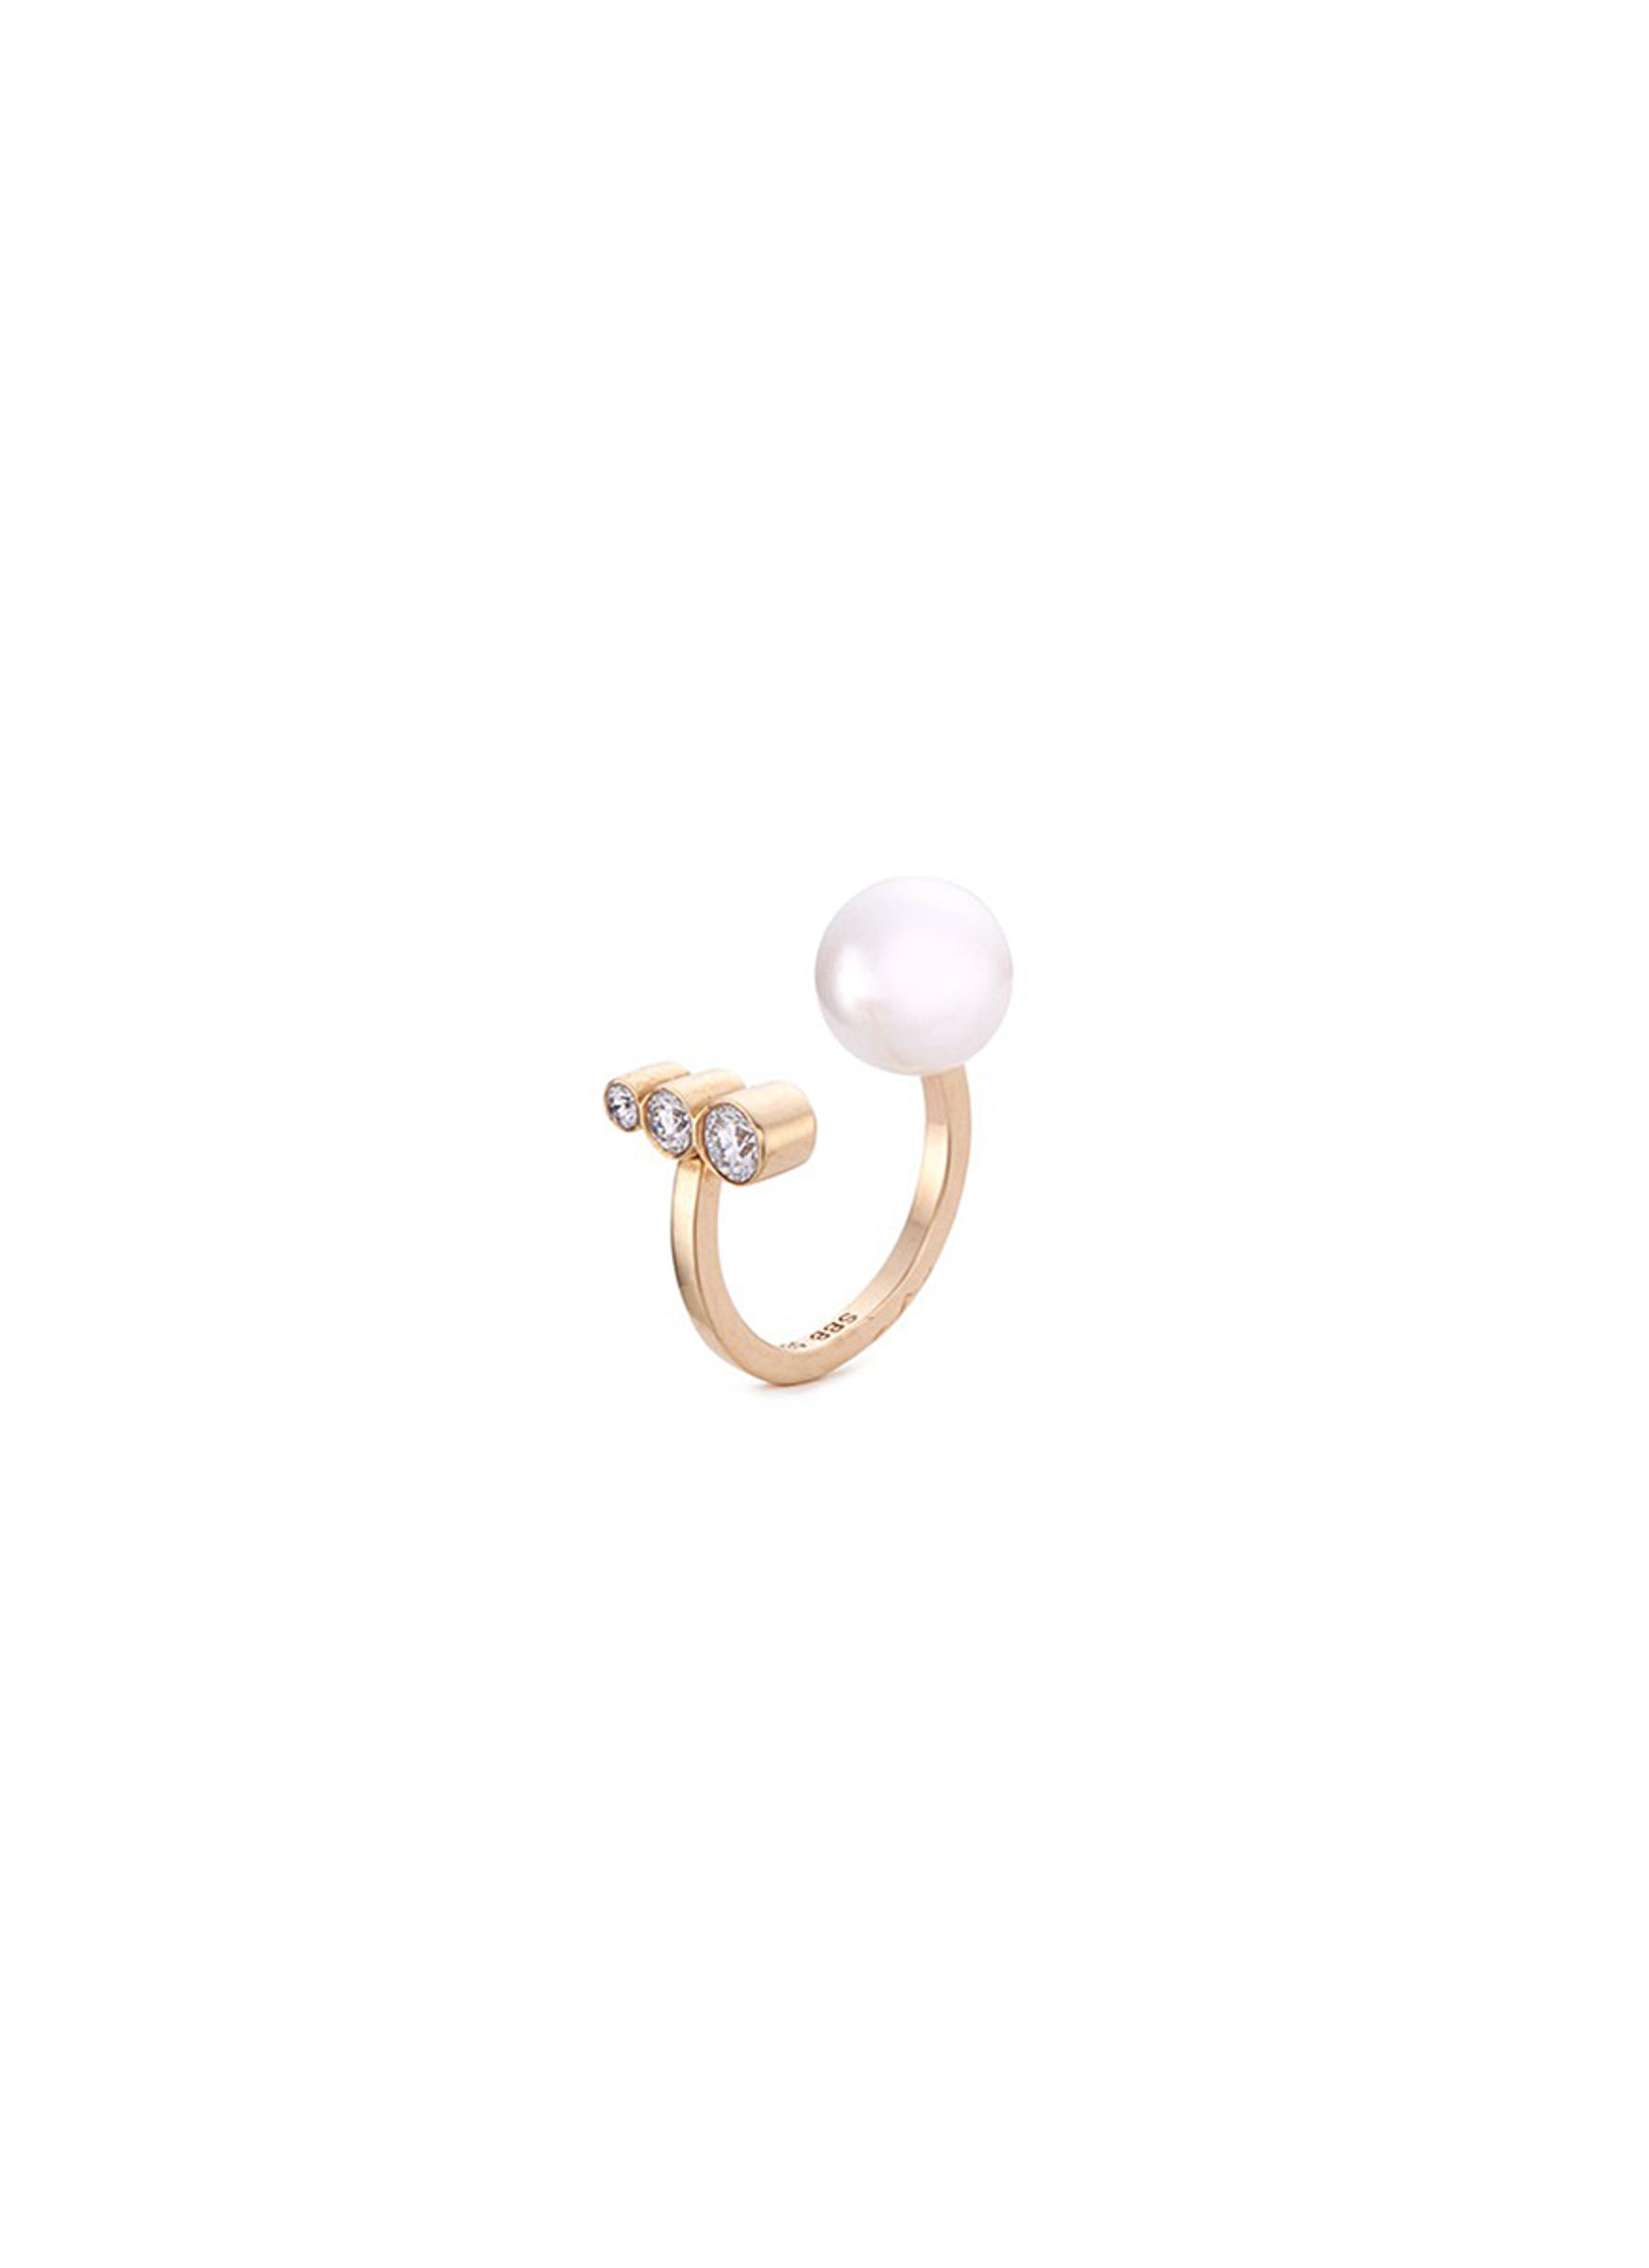 Emma Perle Akoya pearl diamond 14k gold ring by Sophie Bille Brahe